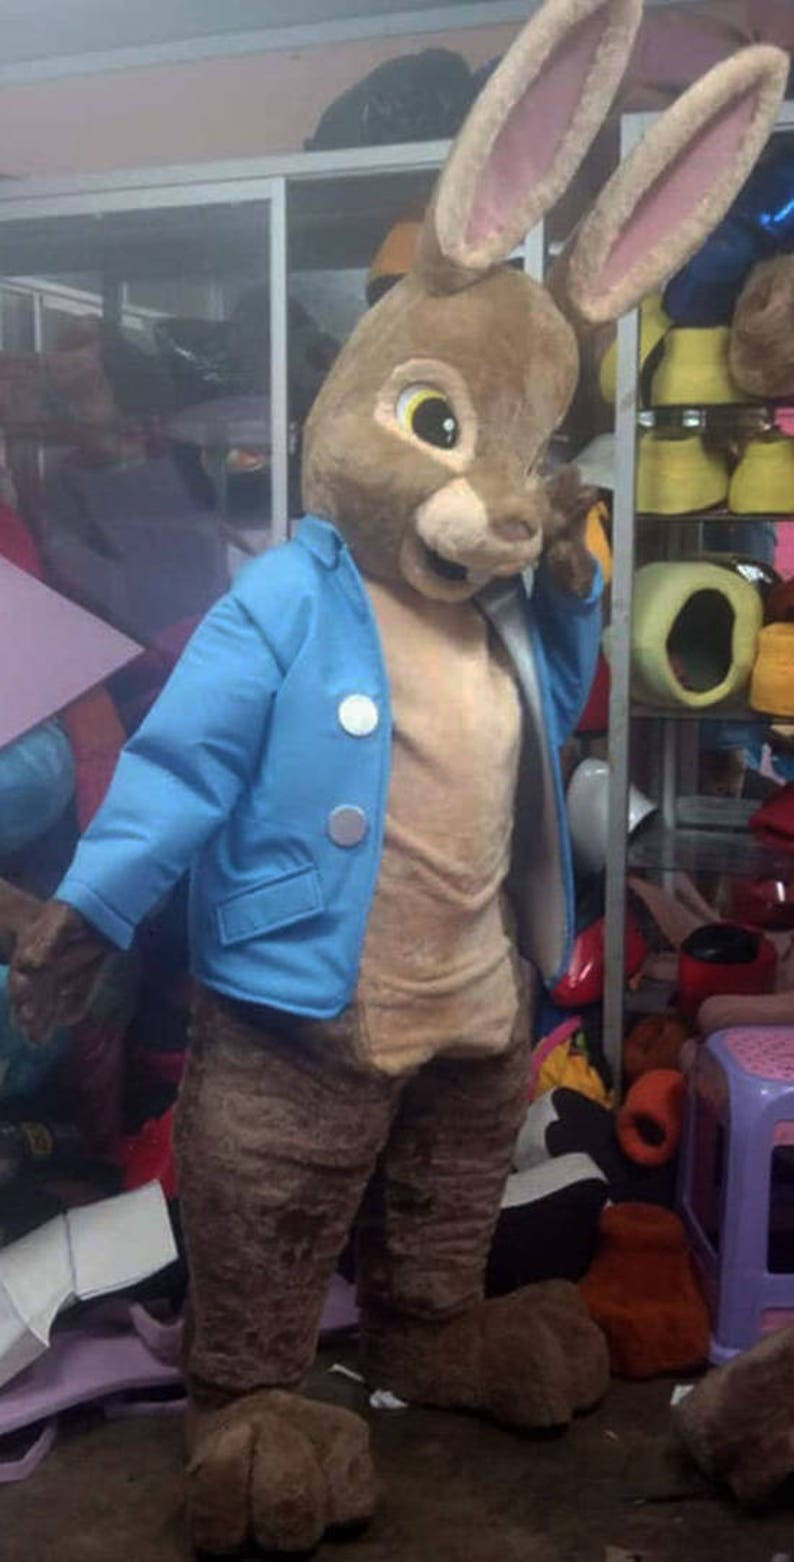 698a78b5f0af3 Peter Rabbit Mascot Costume Adult Rabbit Costume For Sale